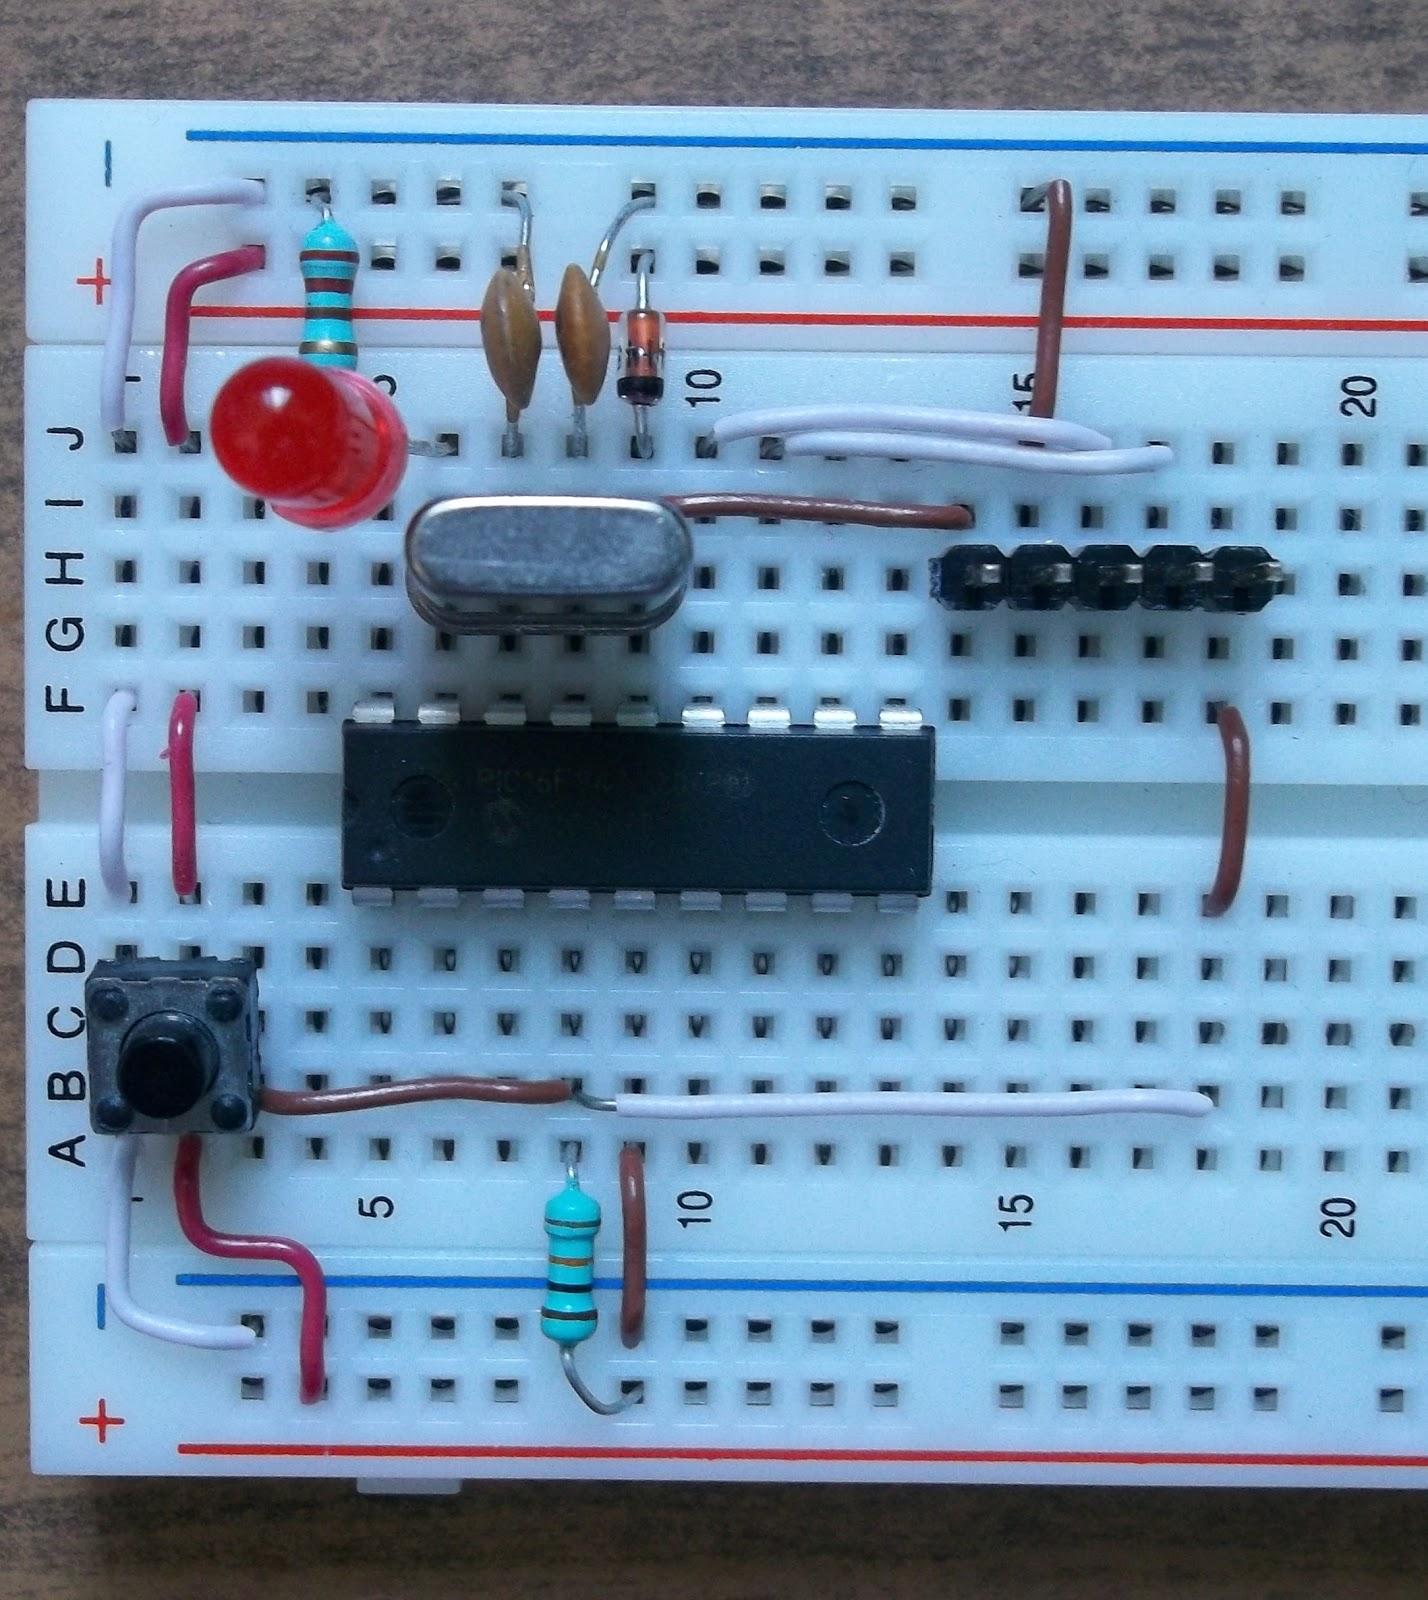 1 знакомство с микроконтроллером pic16f84a